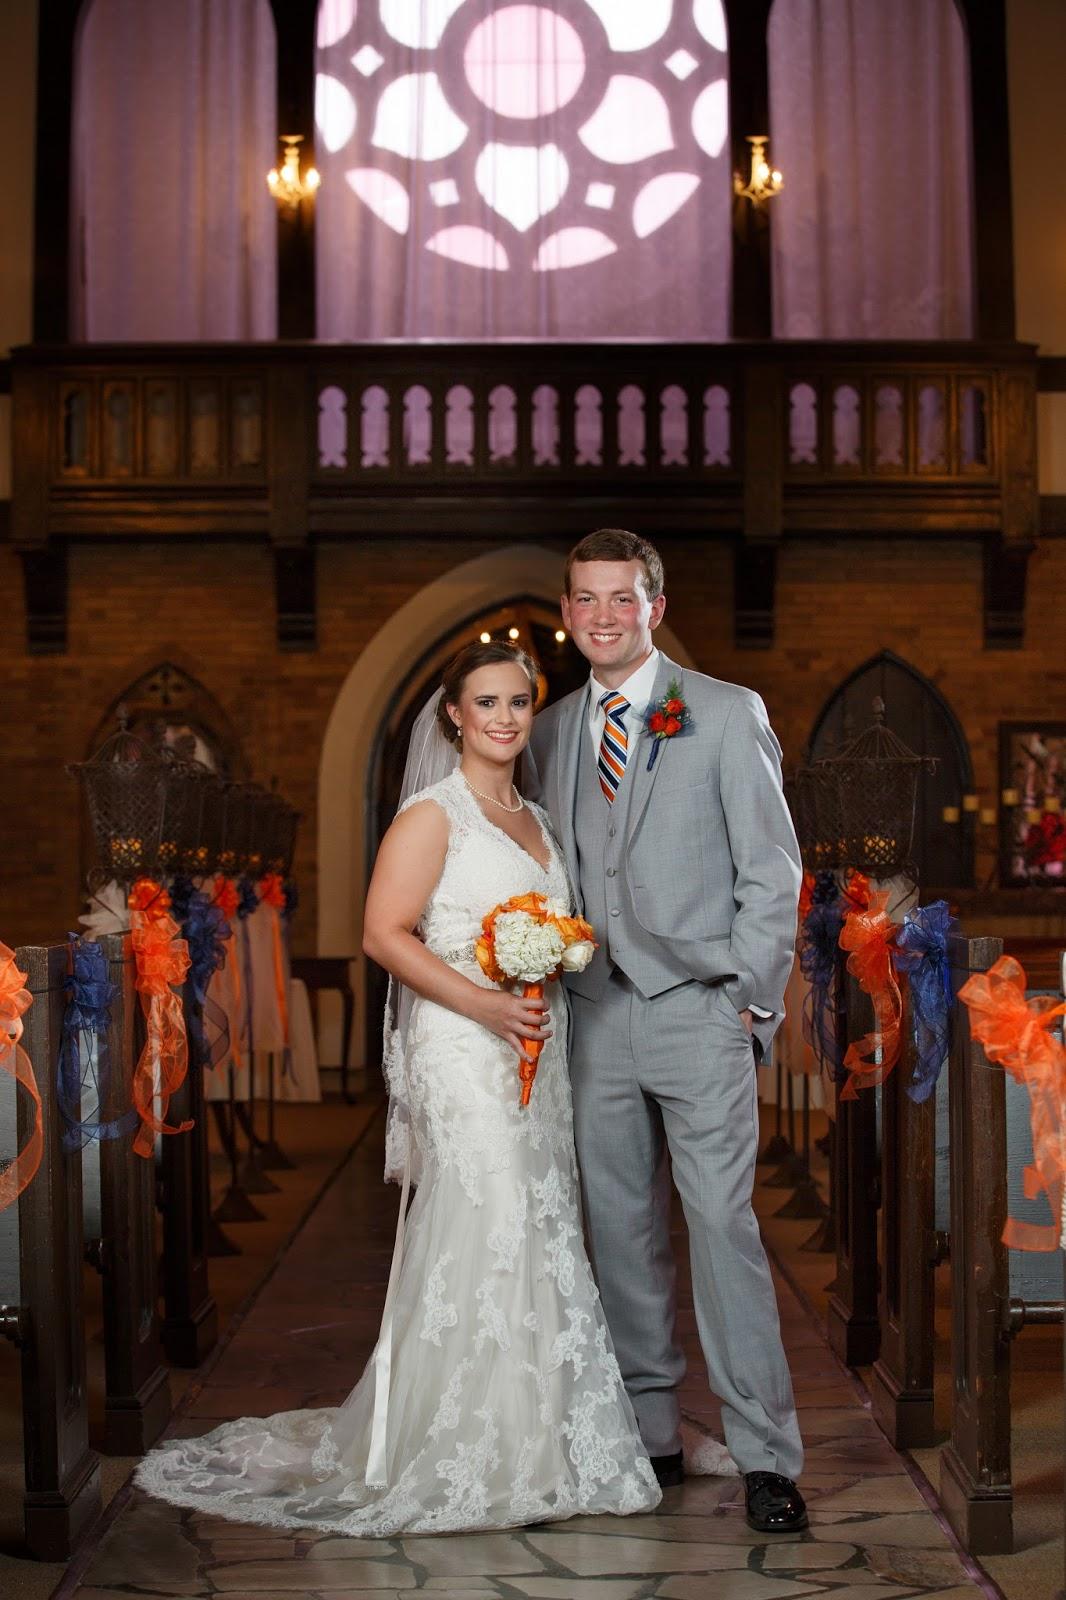 Cable Photography & Video: Natalie Sorah & Dustin Vaughn - Wedding ...